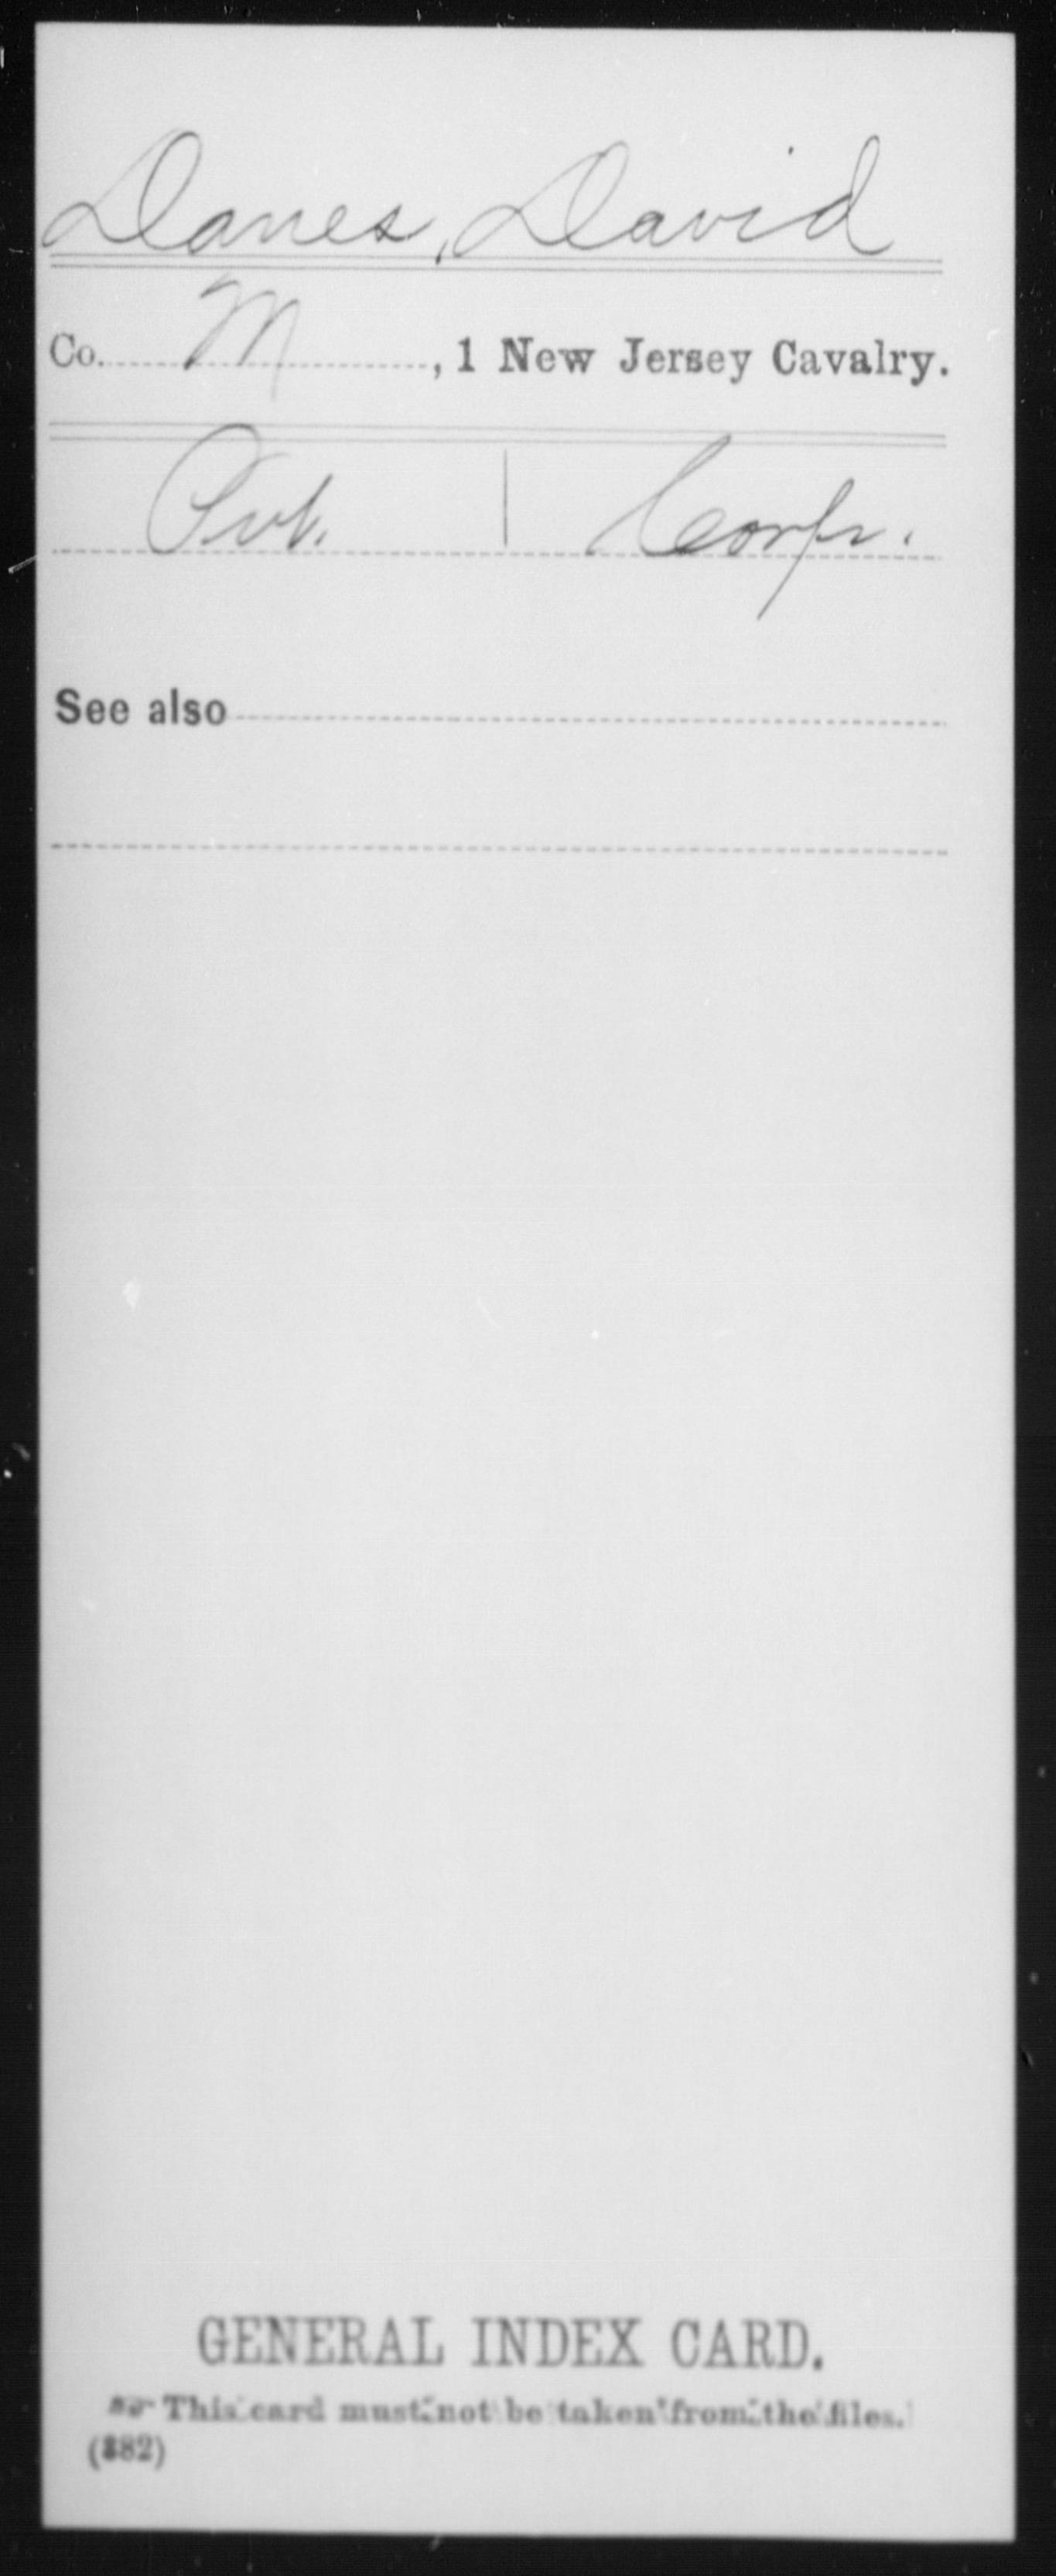 [New Jersey] Danes, David - 1st Cavalry, Company M